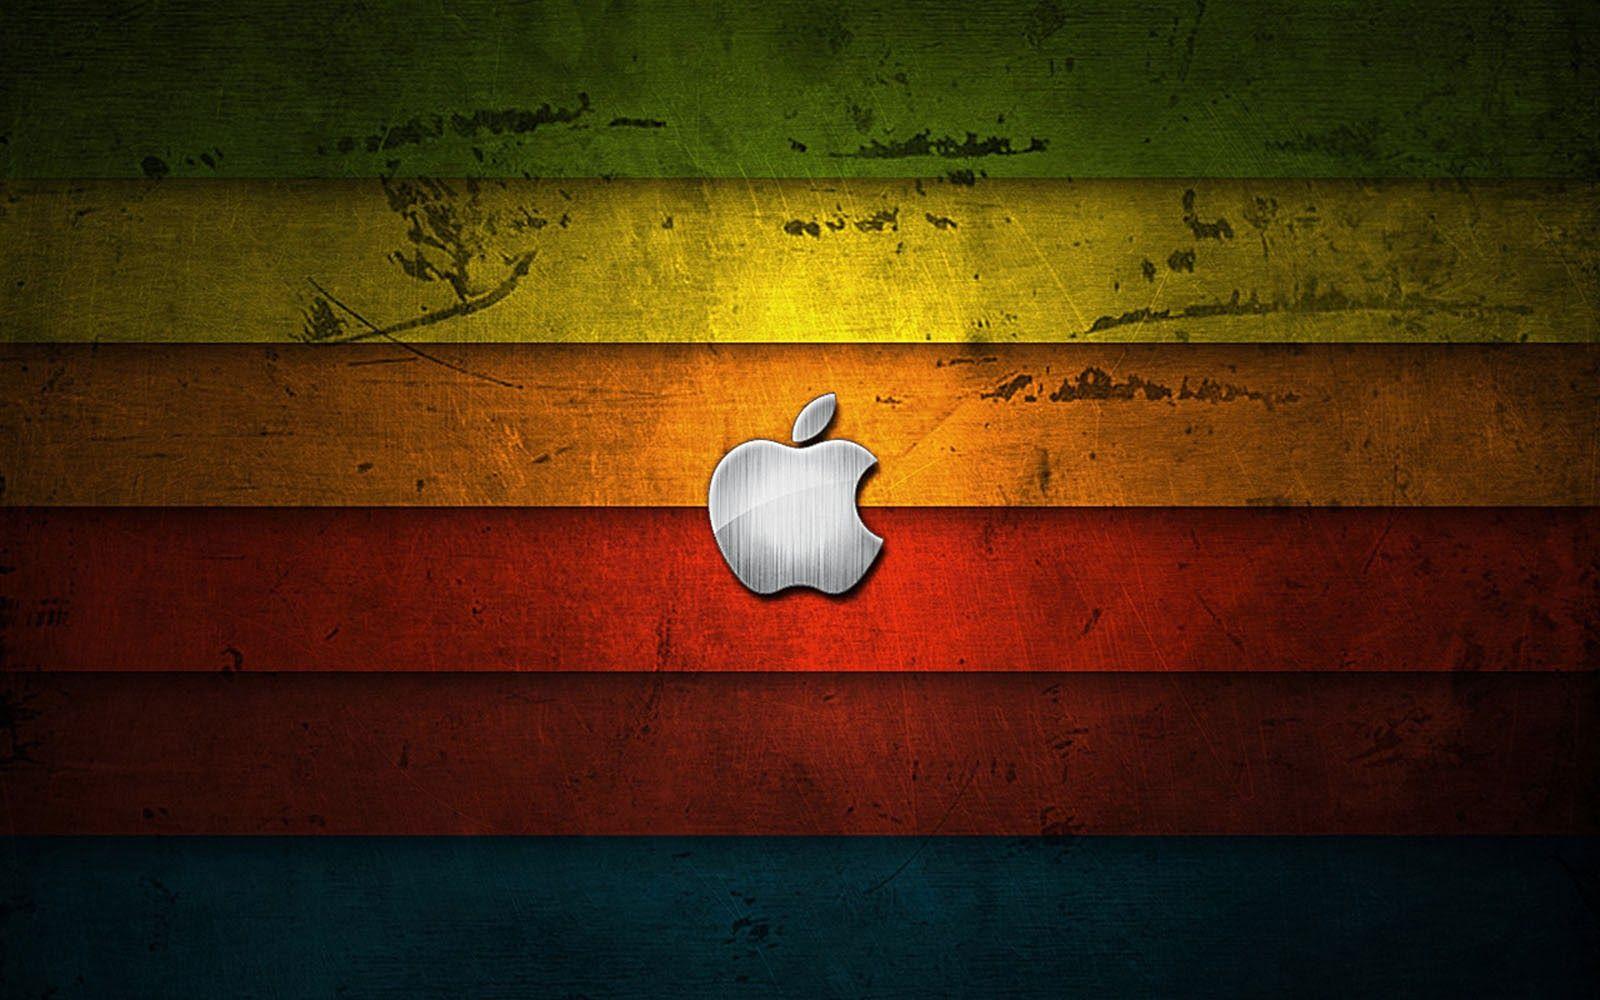 Apple Hd Wallpapers Group Apple Hd Wallpaper Apple Logo Wallpaper Apple Wallpaper Cool Apple Logo